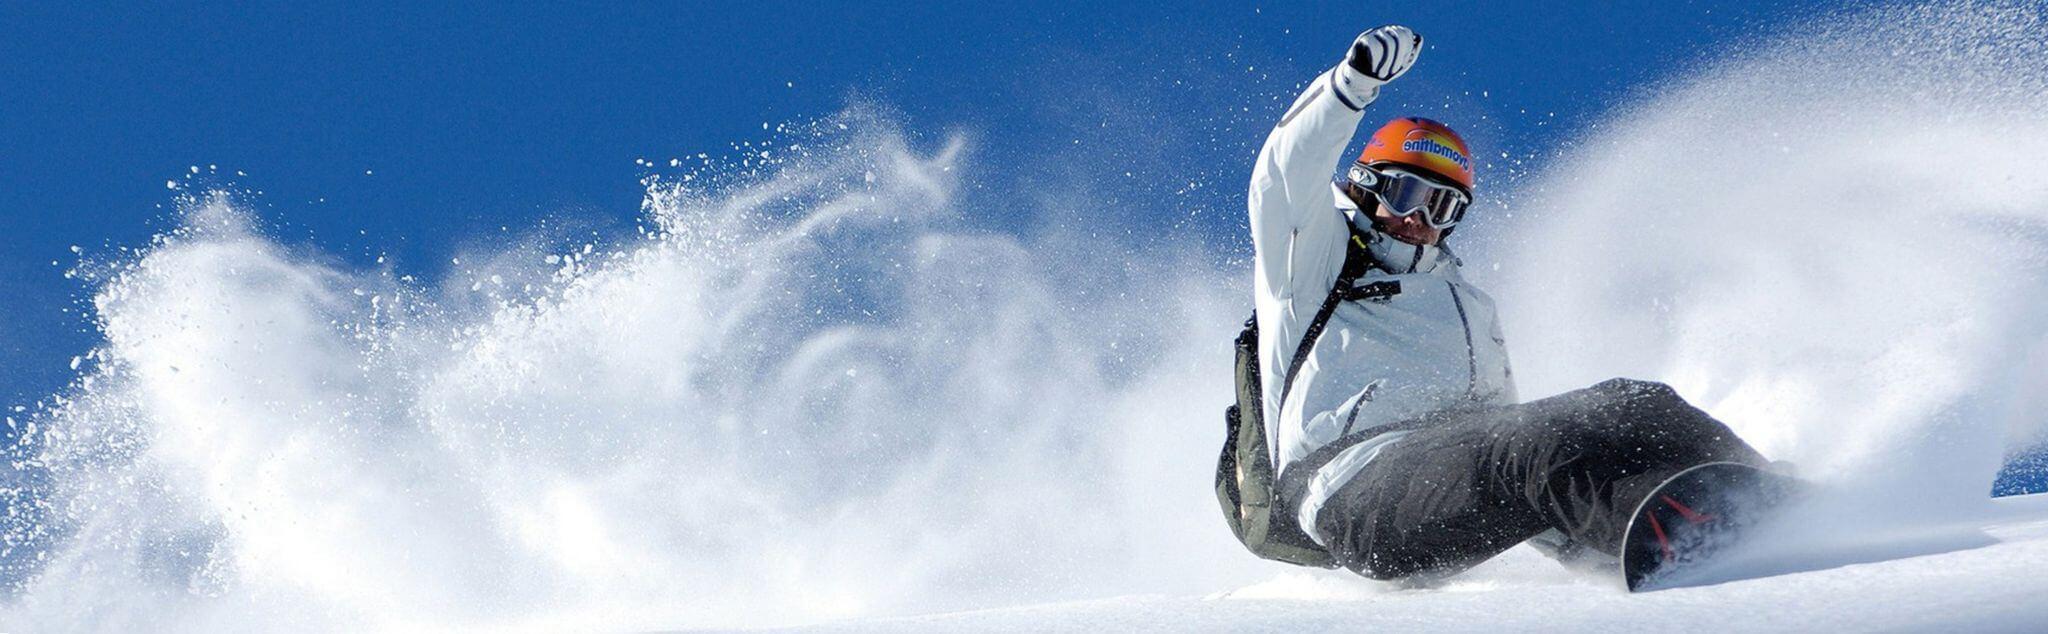 Snowboard a Verona